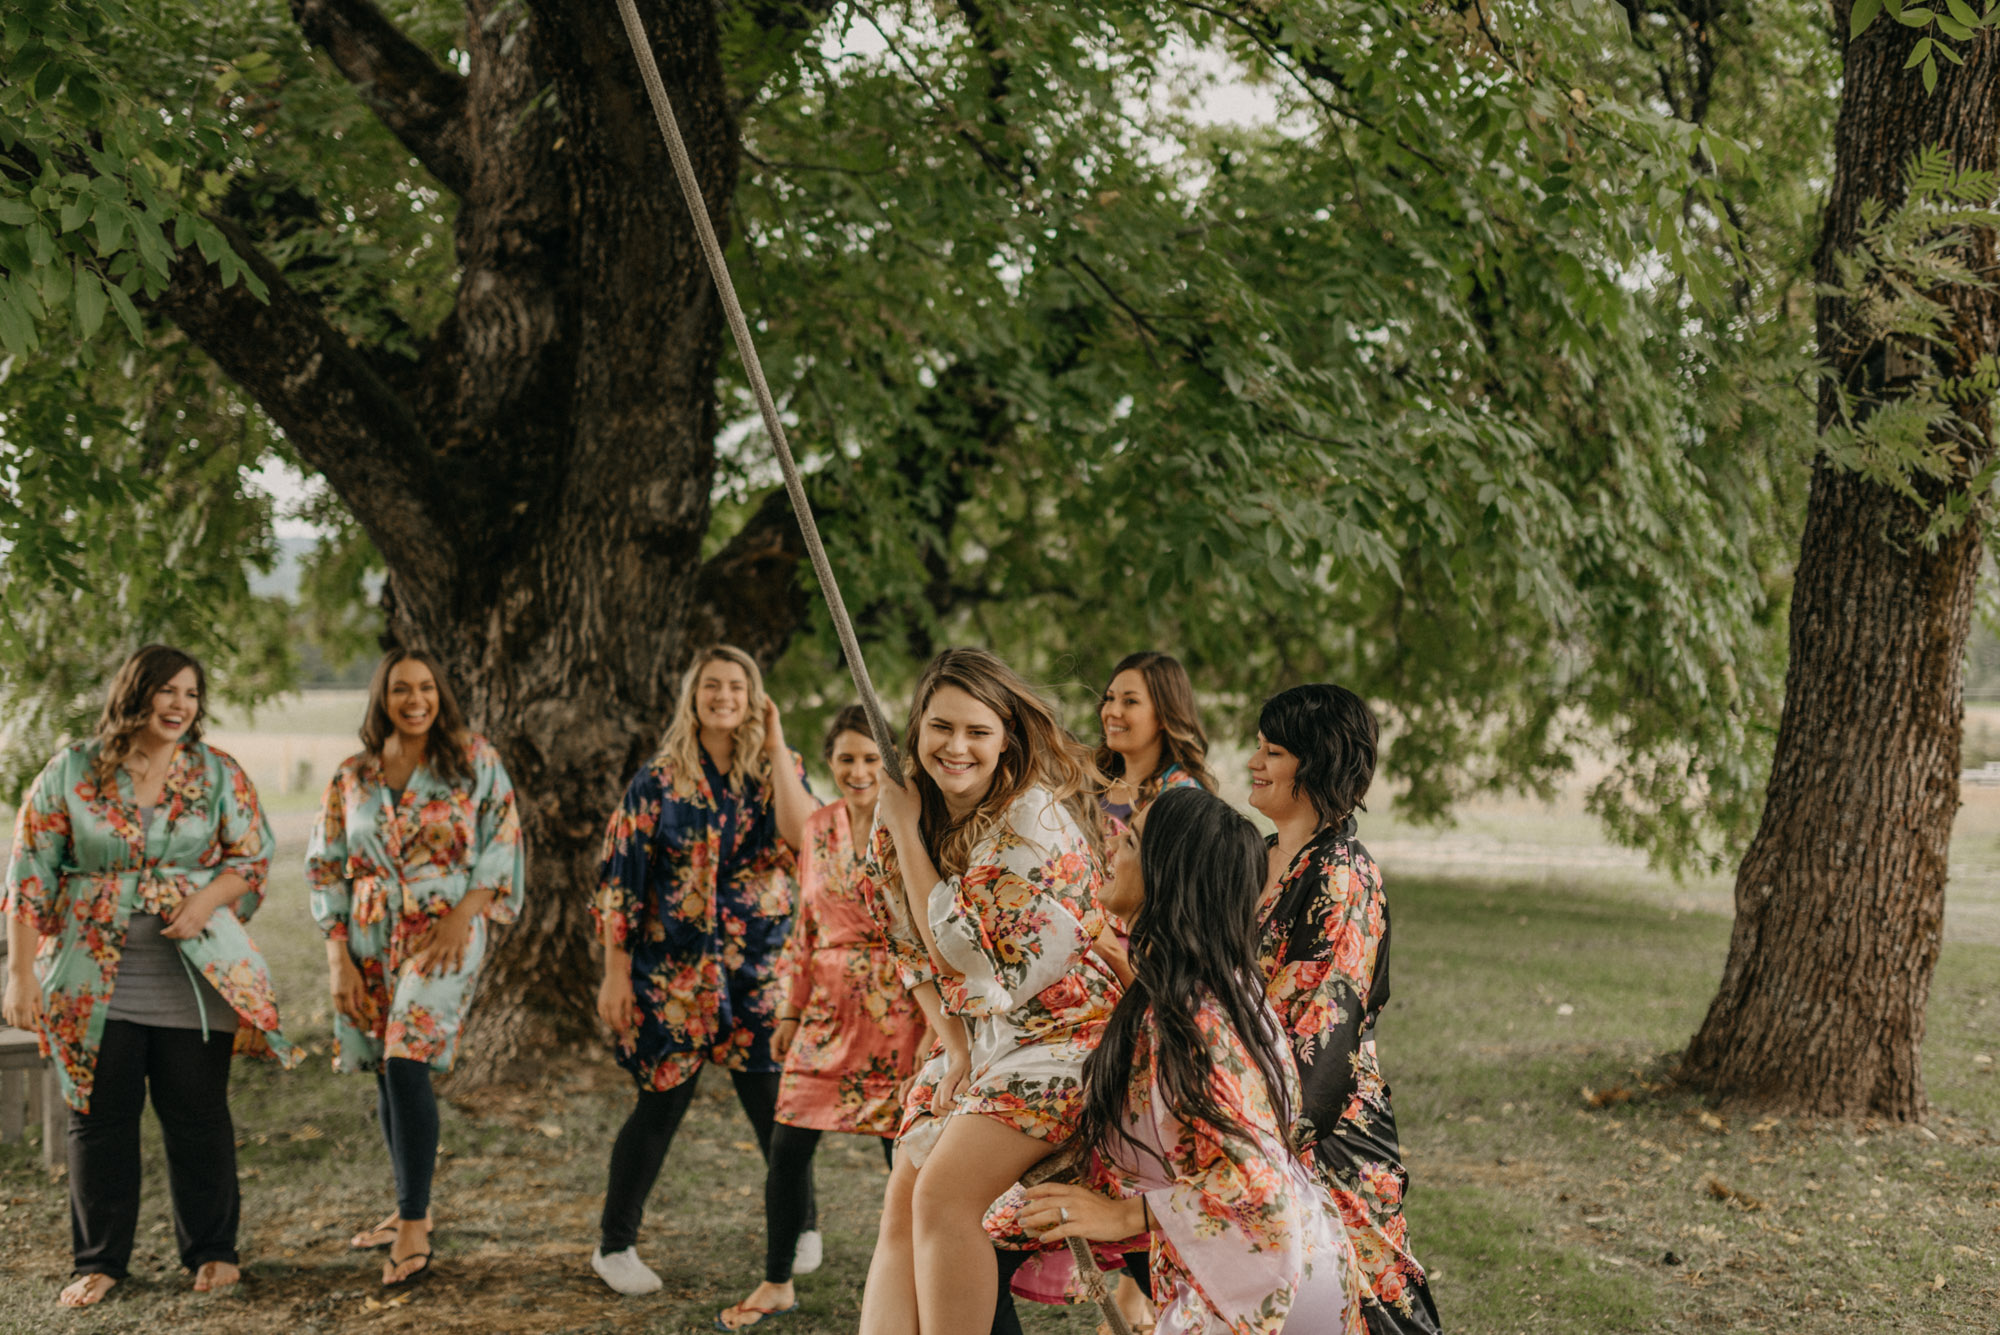 Getting-Ready-Swingset-Washington-Wedding-ringshot-7896.jpg